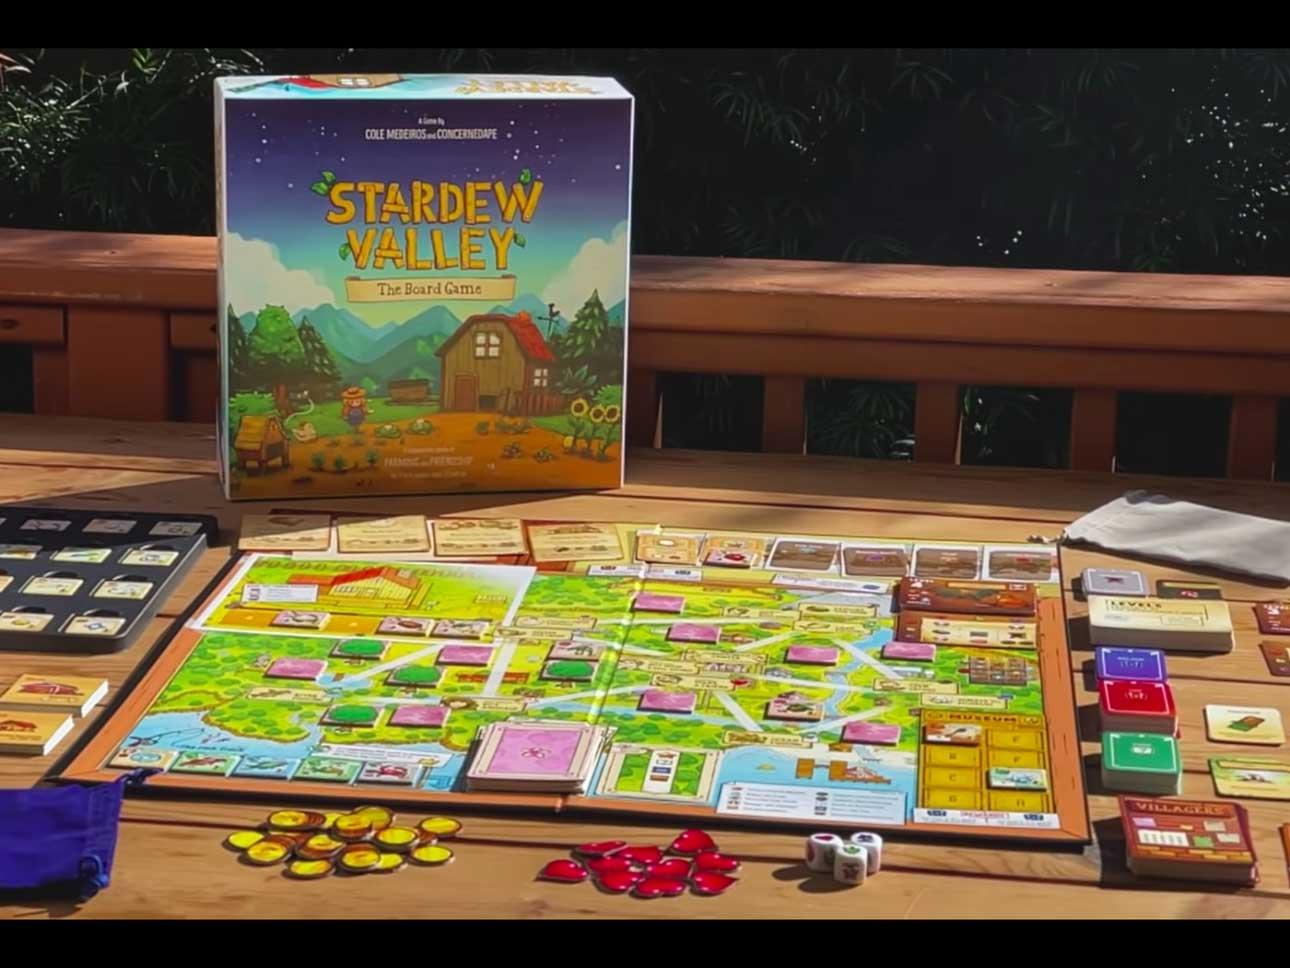 Stardew Valley Board Game Layout